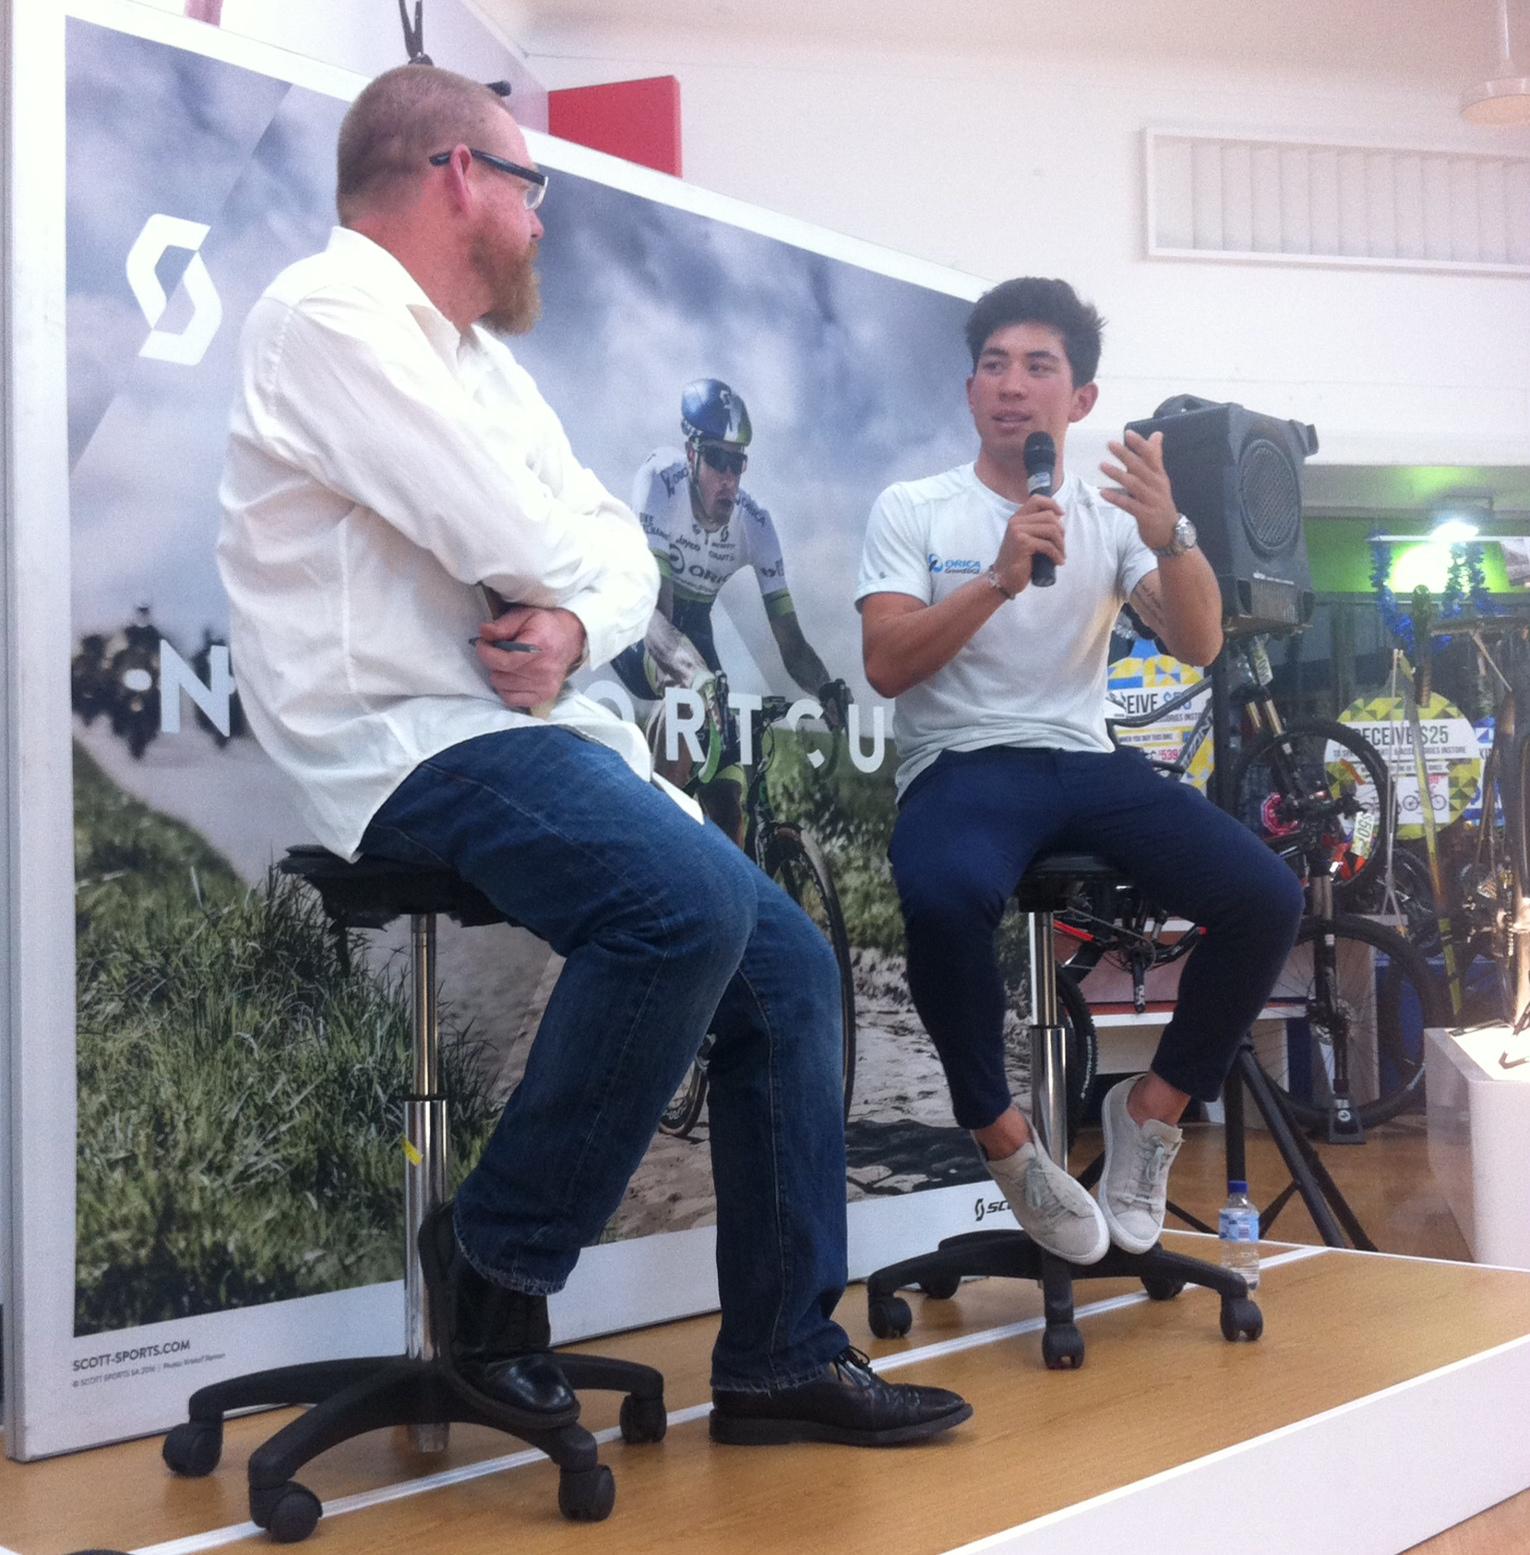 Paul Craft & Caleb Ewan at AvantiPlus Narrabeen. Crafty did a great interview with Caleb.